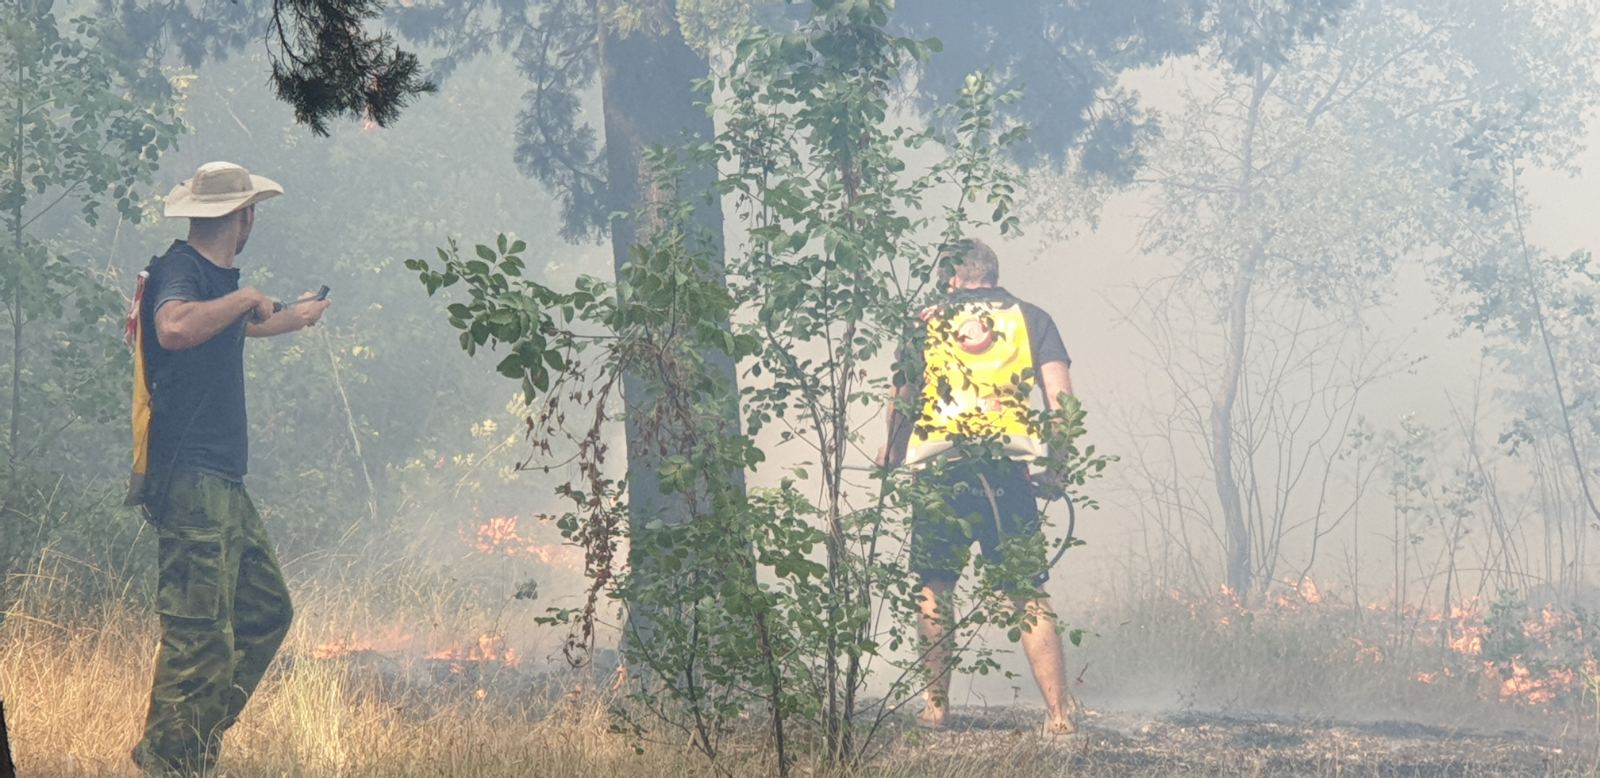 Požar na Gorici trenutno pod kontrolom; Očekujemo dodatnu podršku nadležnih državnih organa